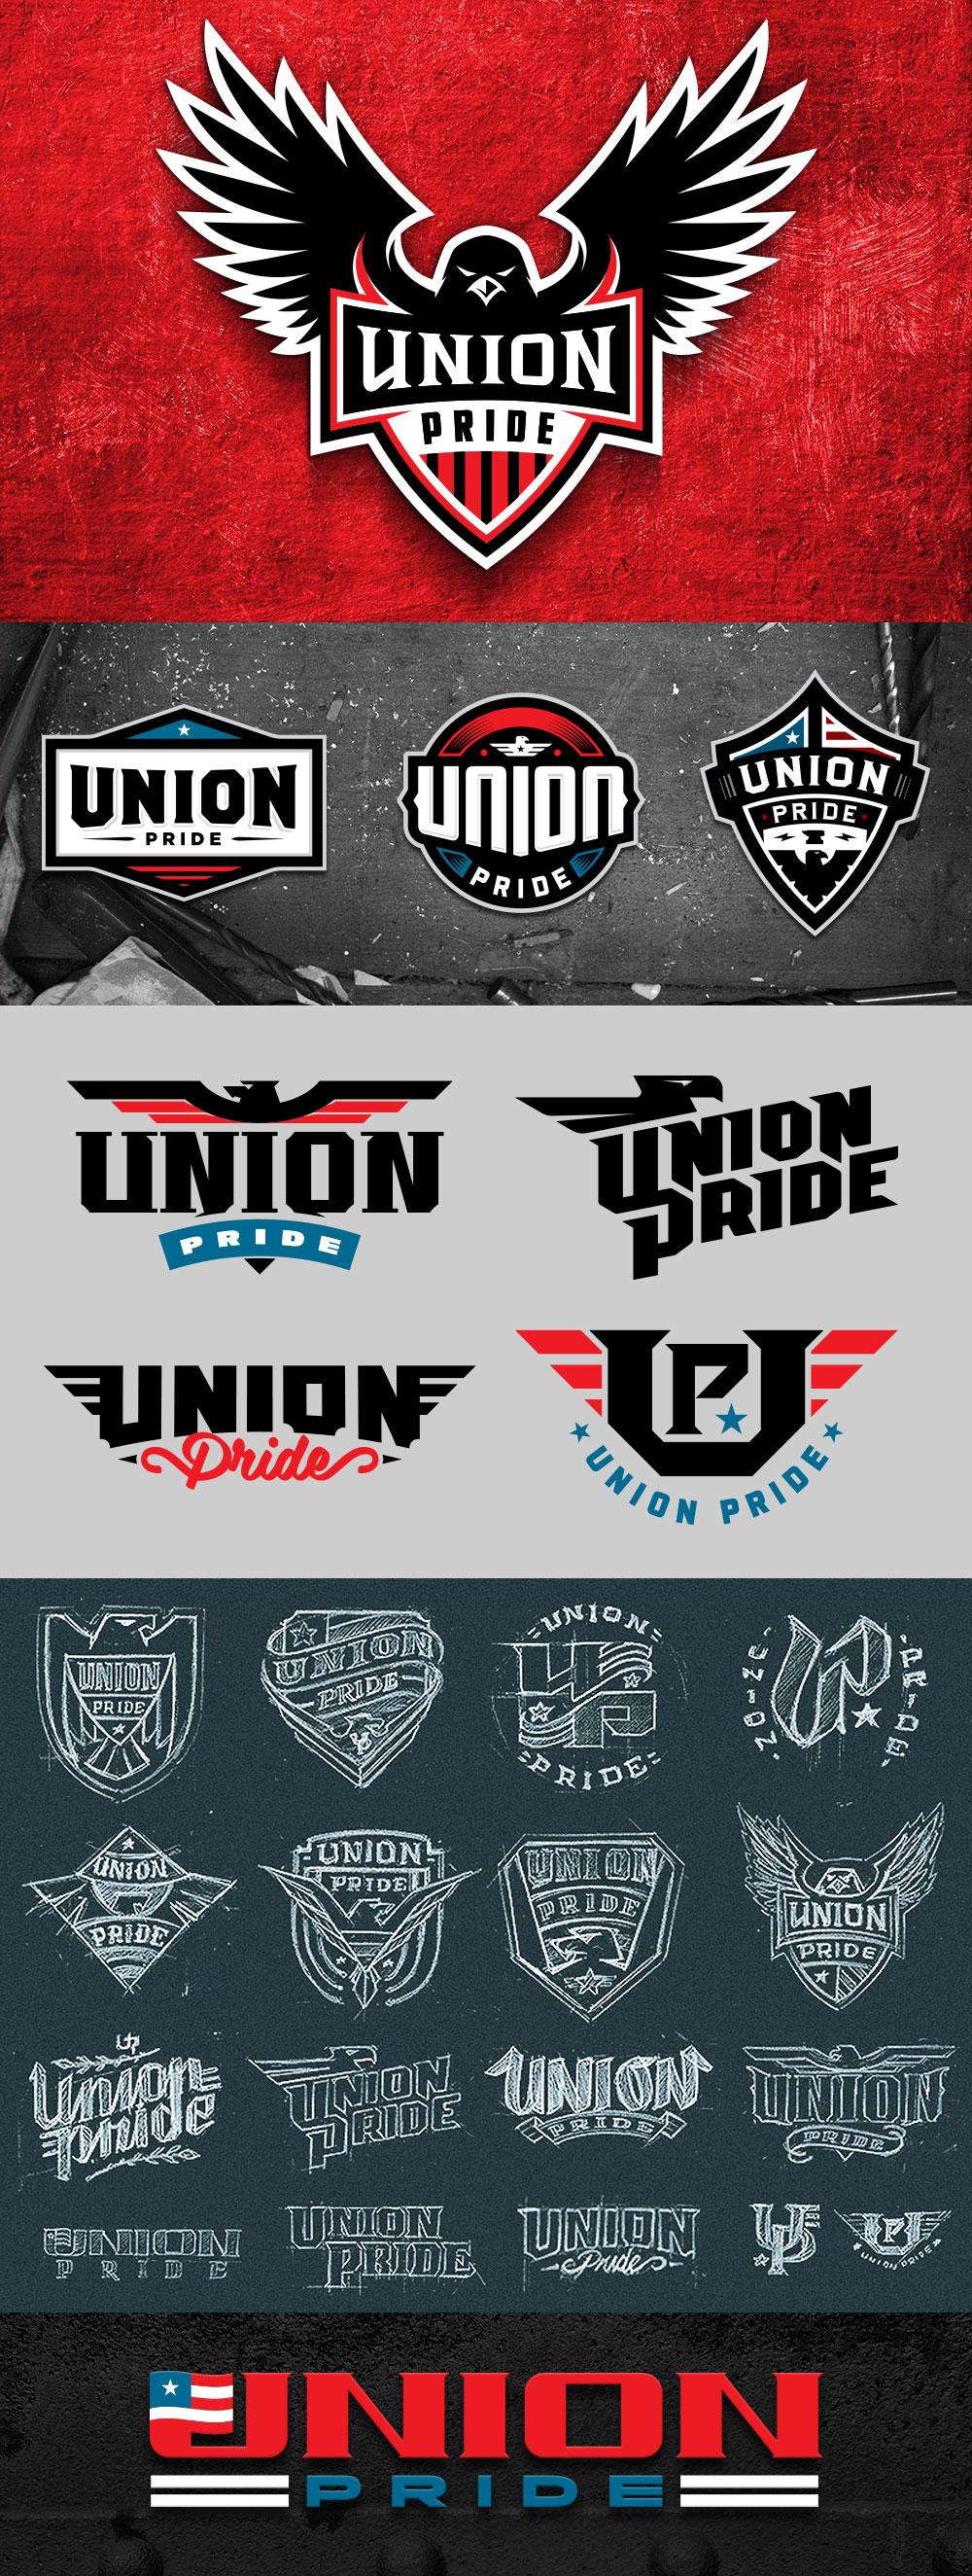 Union_Pride_01.jpg